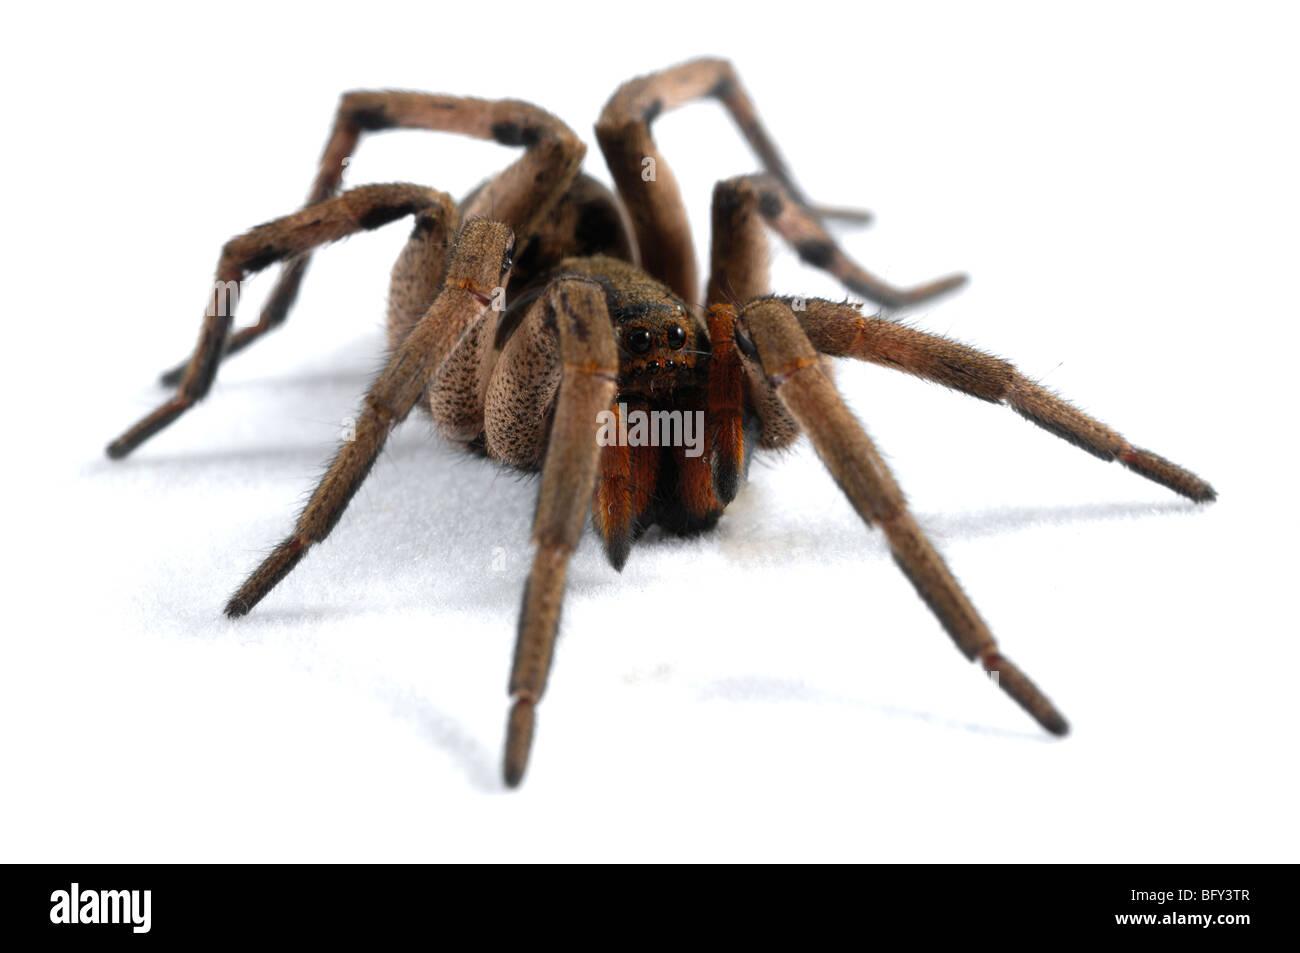 Tarantula type spider; Atlantic Rainforest; Brazil - Stock Image